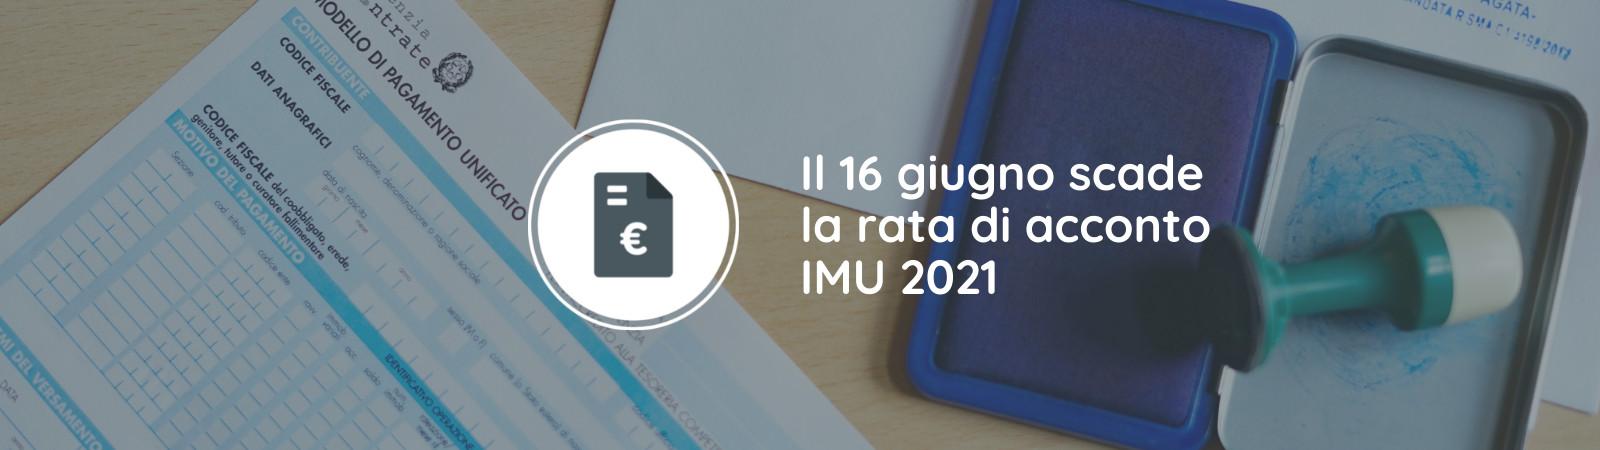 Scadenza acconto IMU 2021